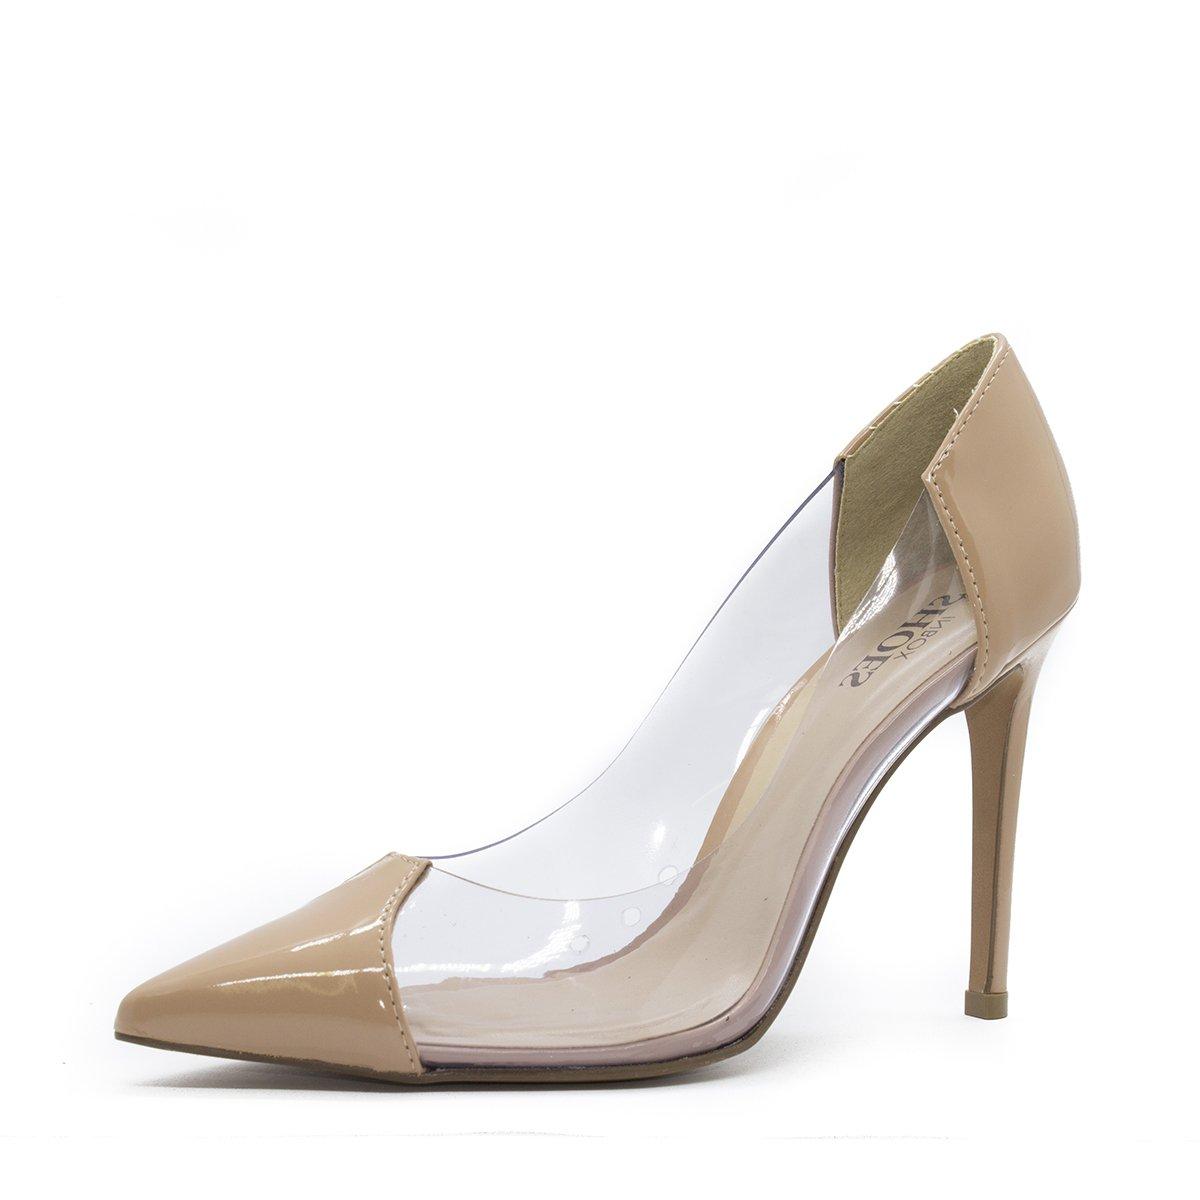 7de39025b Scarpin Vinil Shoes Inbox transparente salto alto fin | Zattini